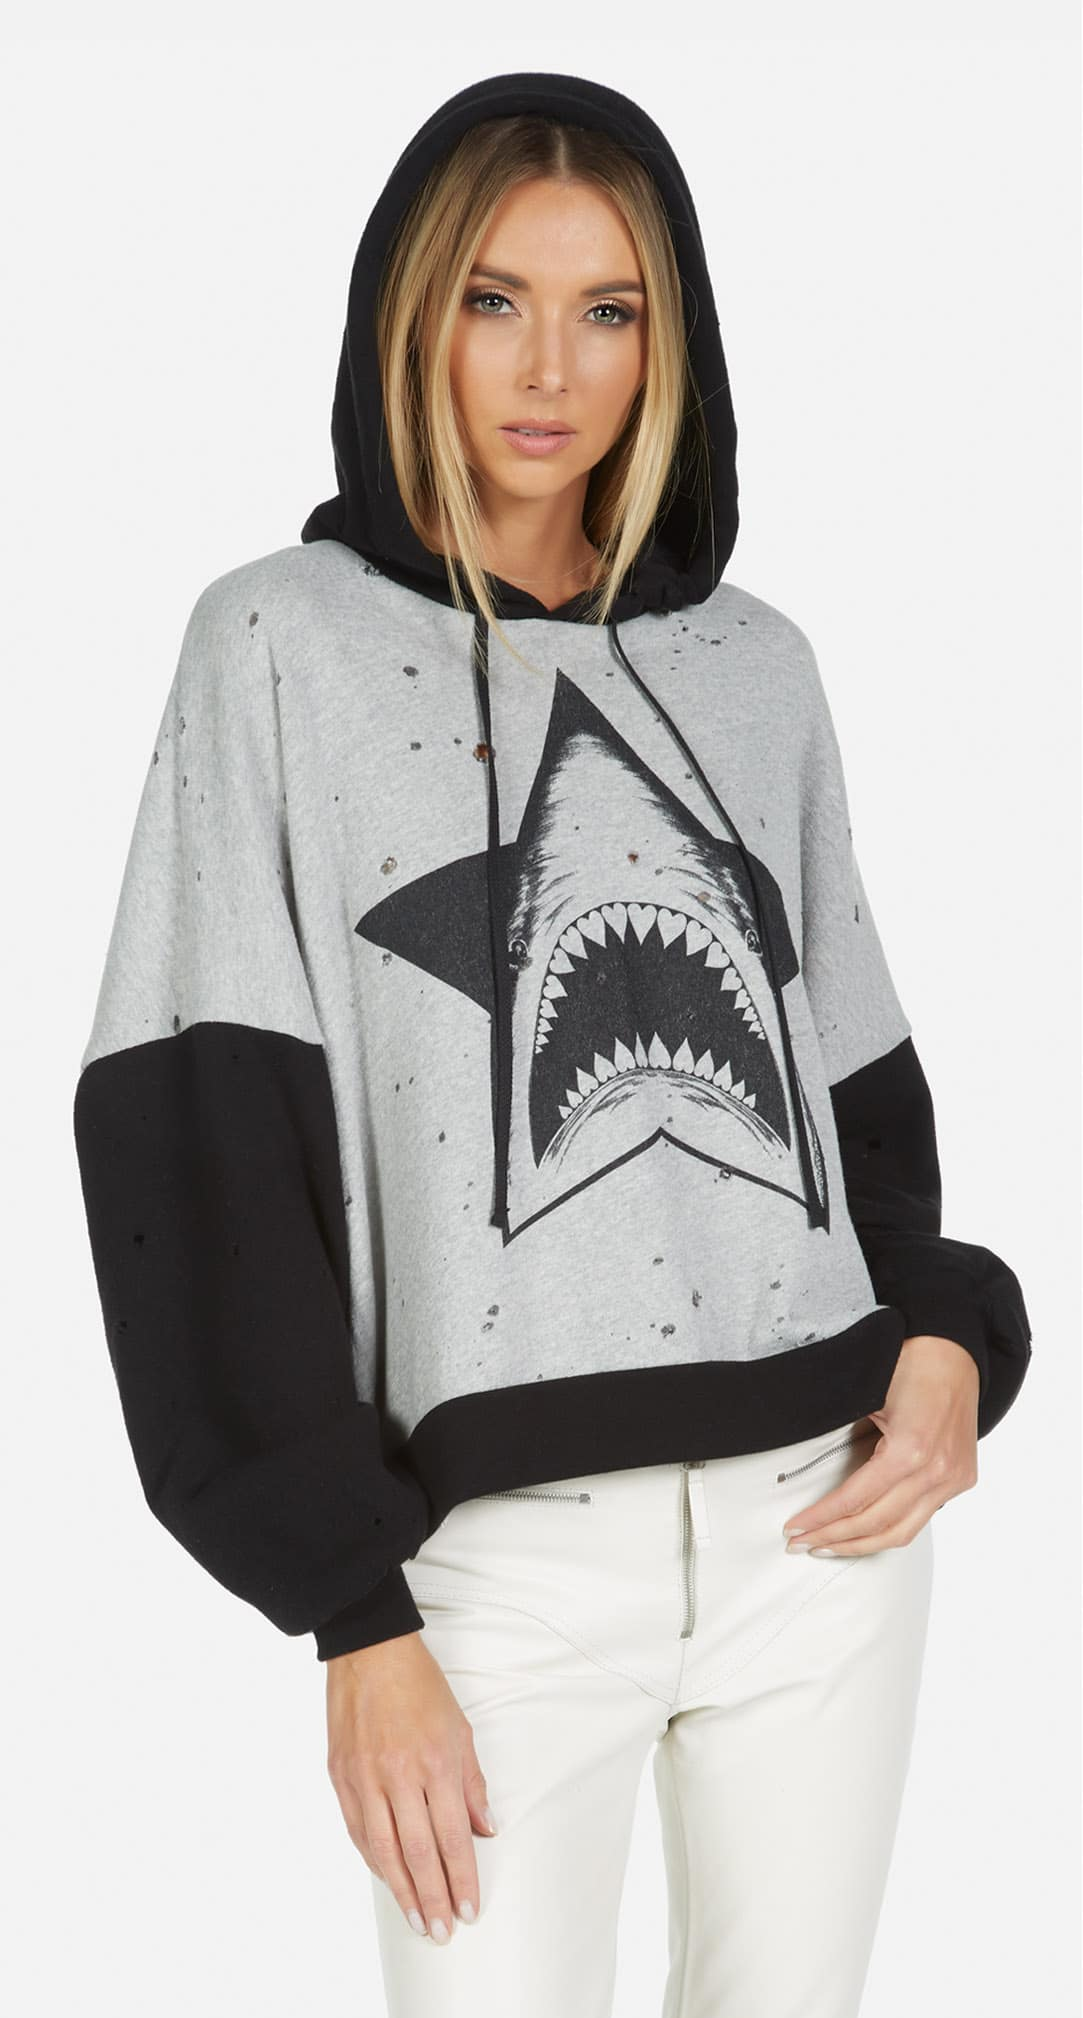 Ellie Star Shark Sweatshirt